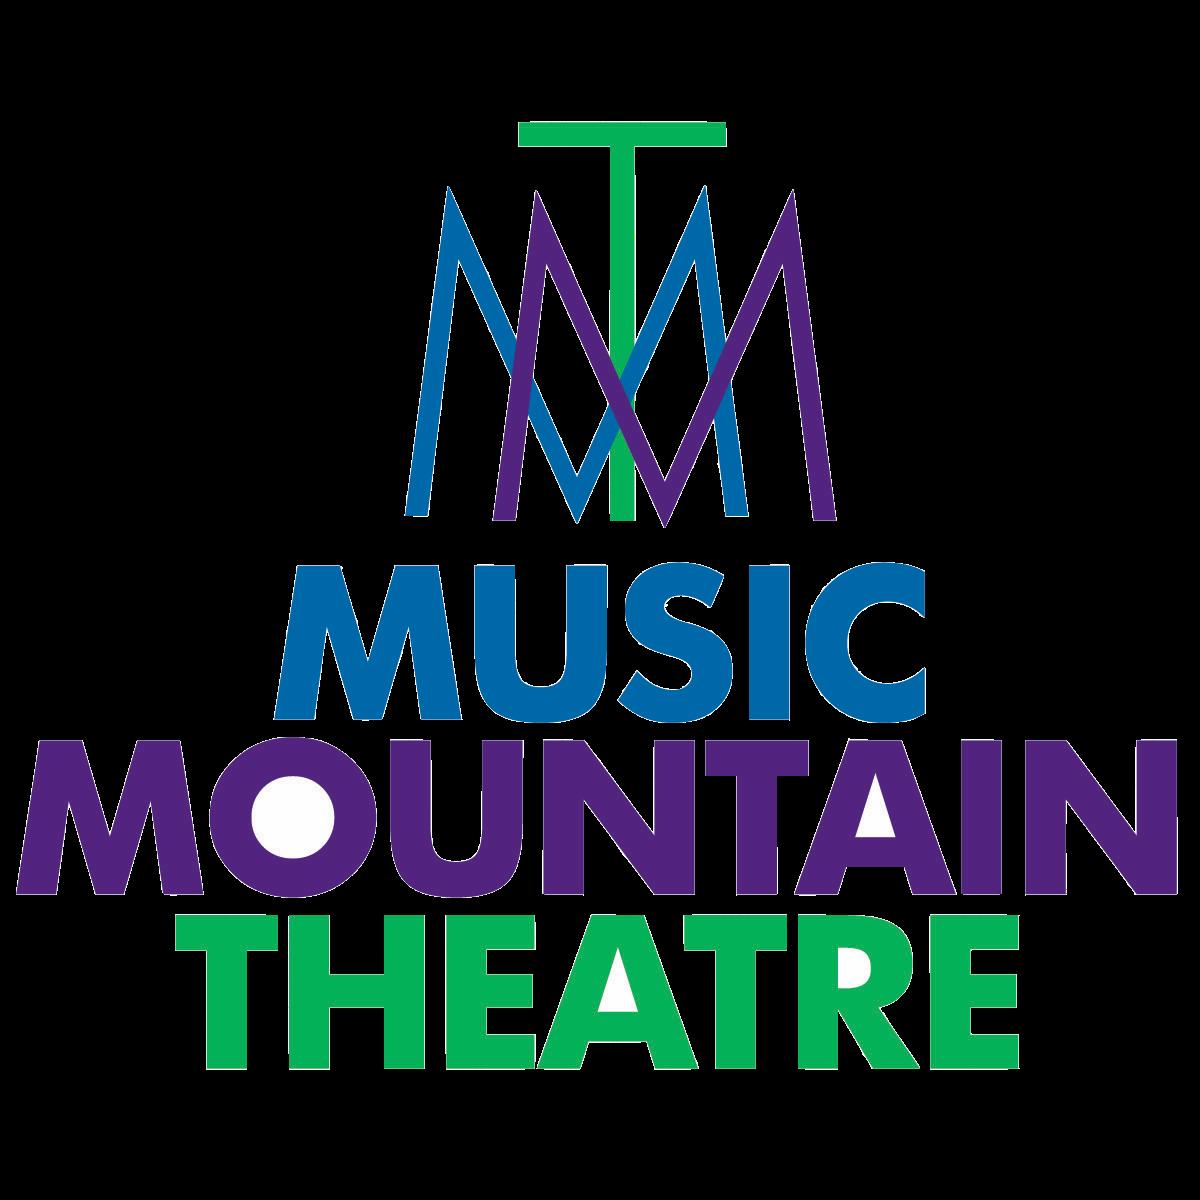 Music Mountain Theatre Coupon